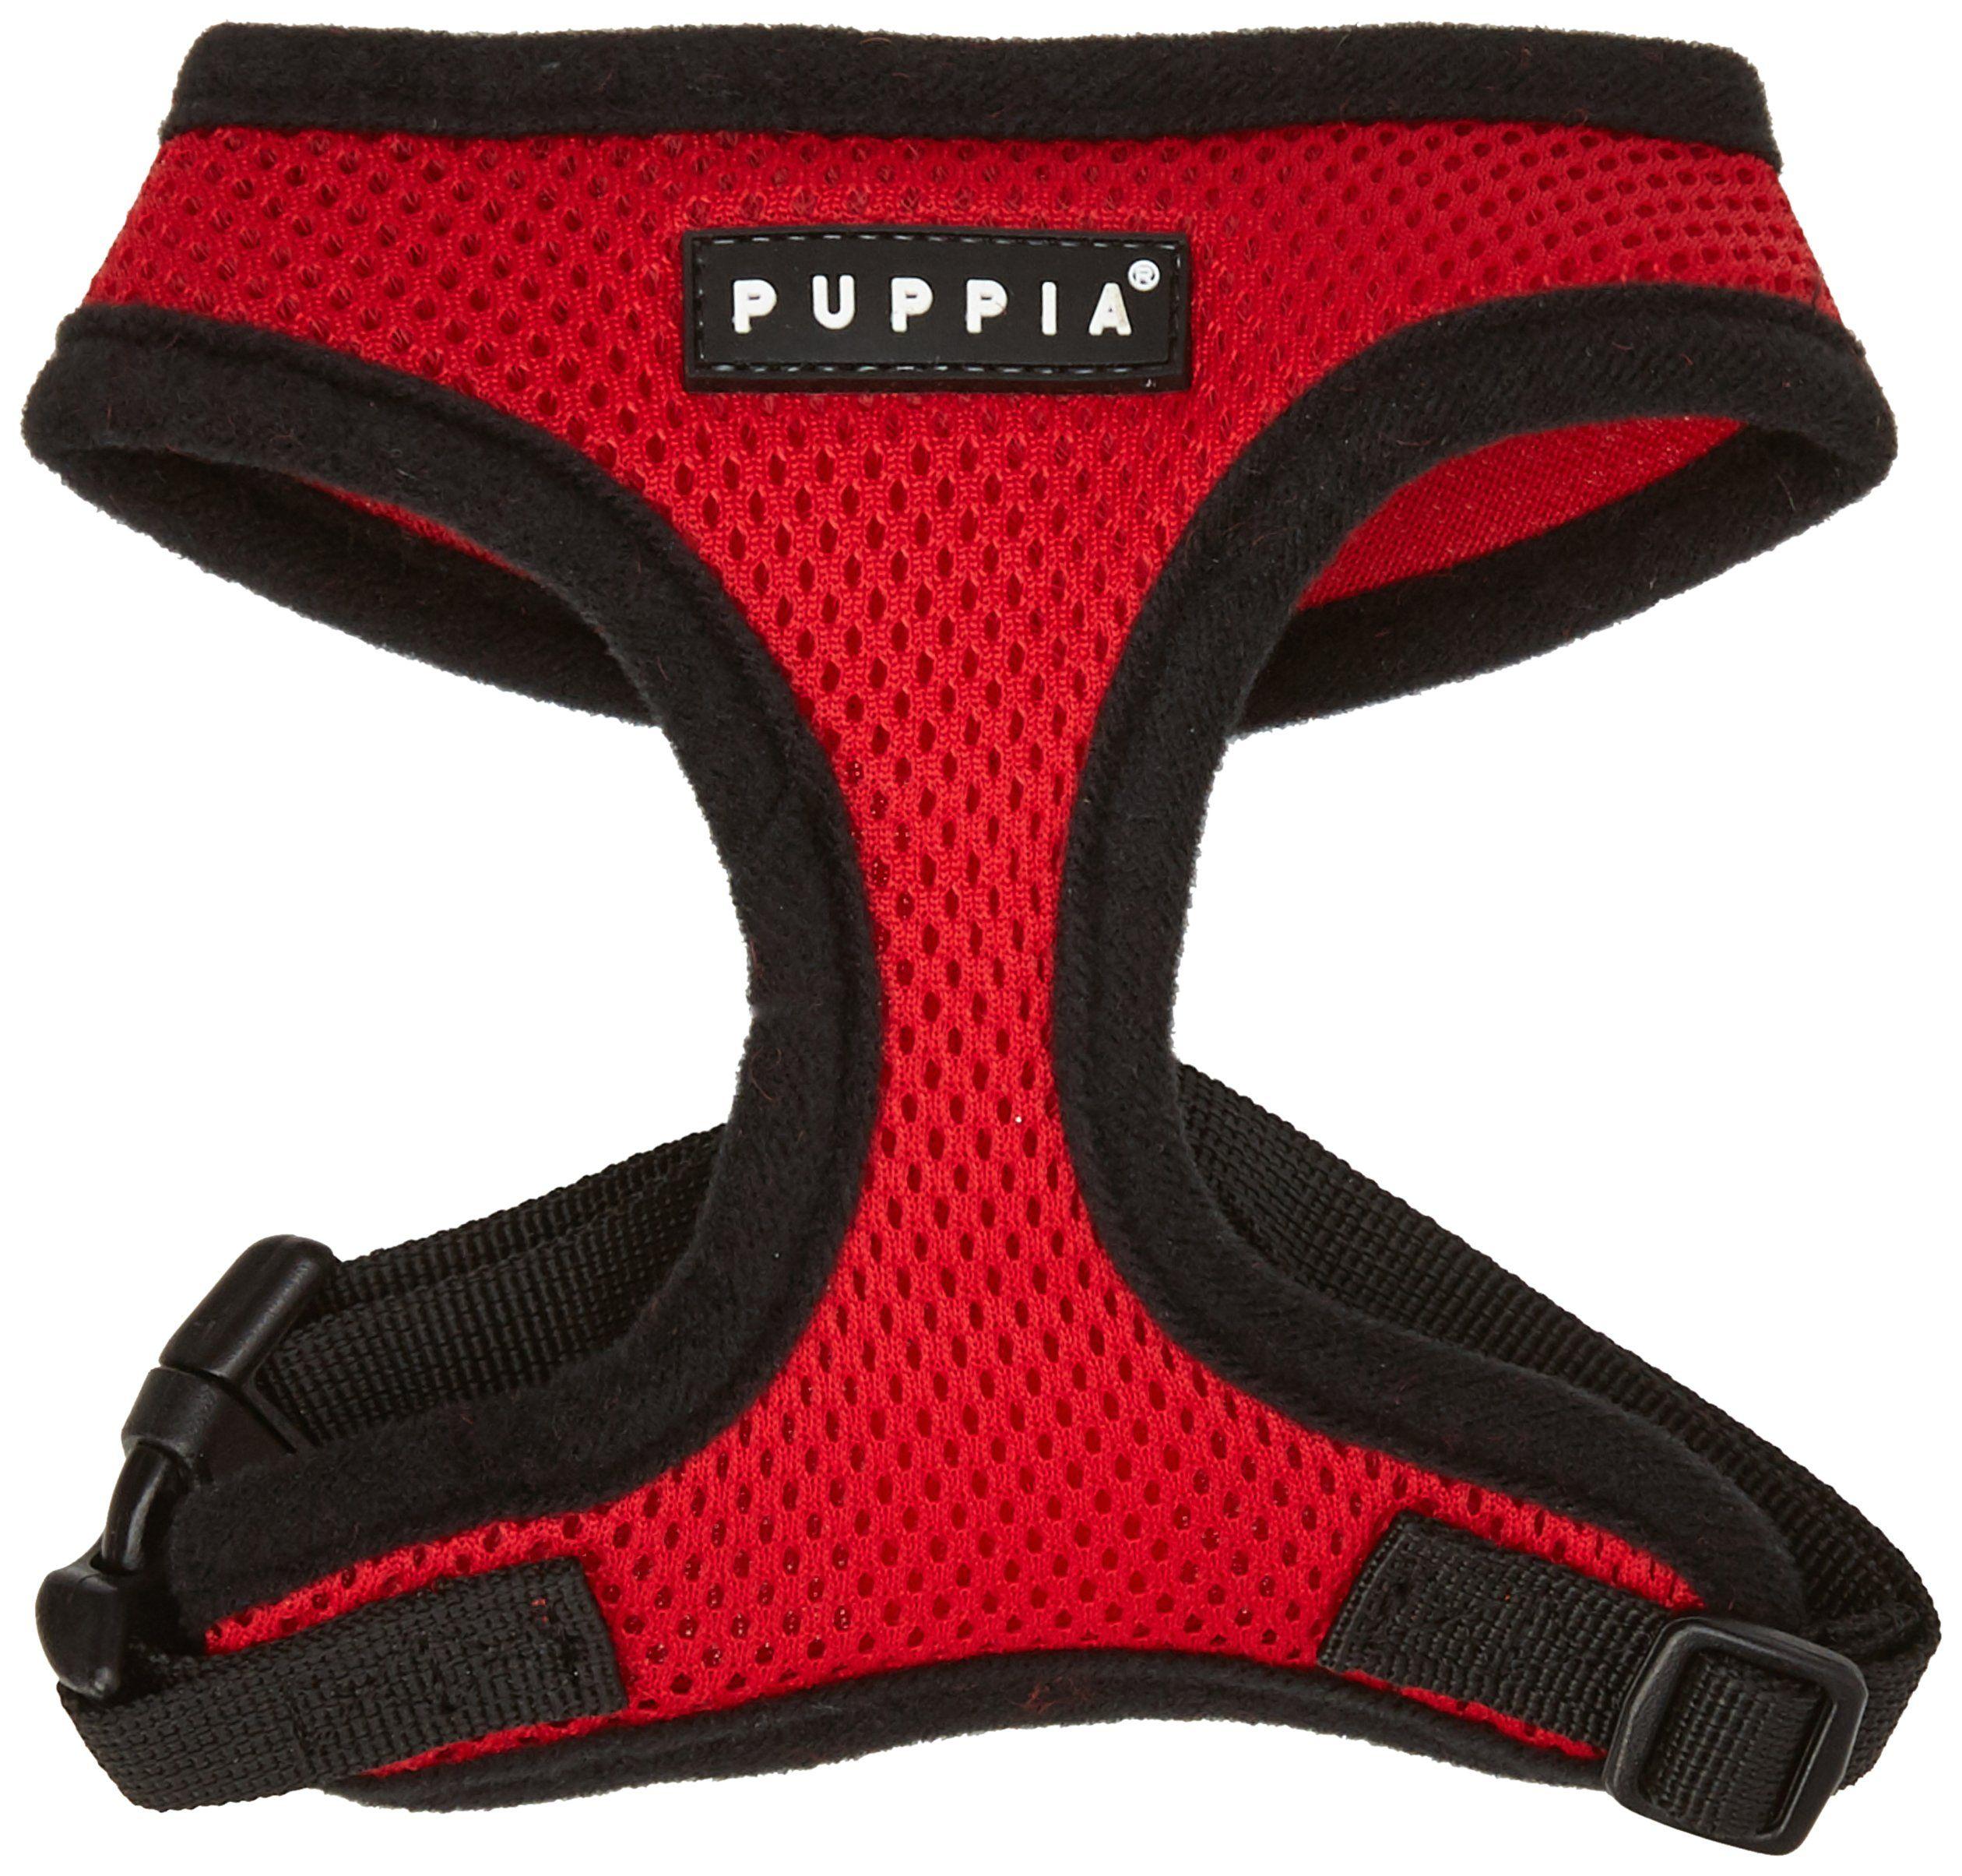 Authentic Puppia Soft Dog Harness Red Medium Details